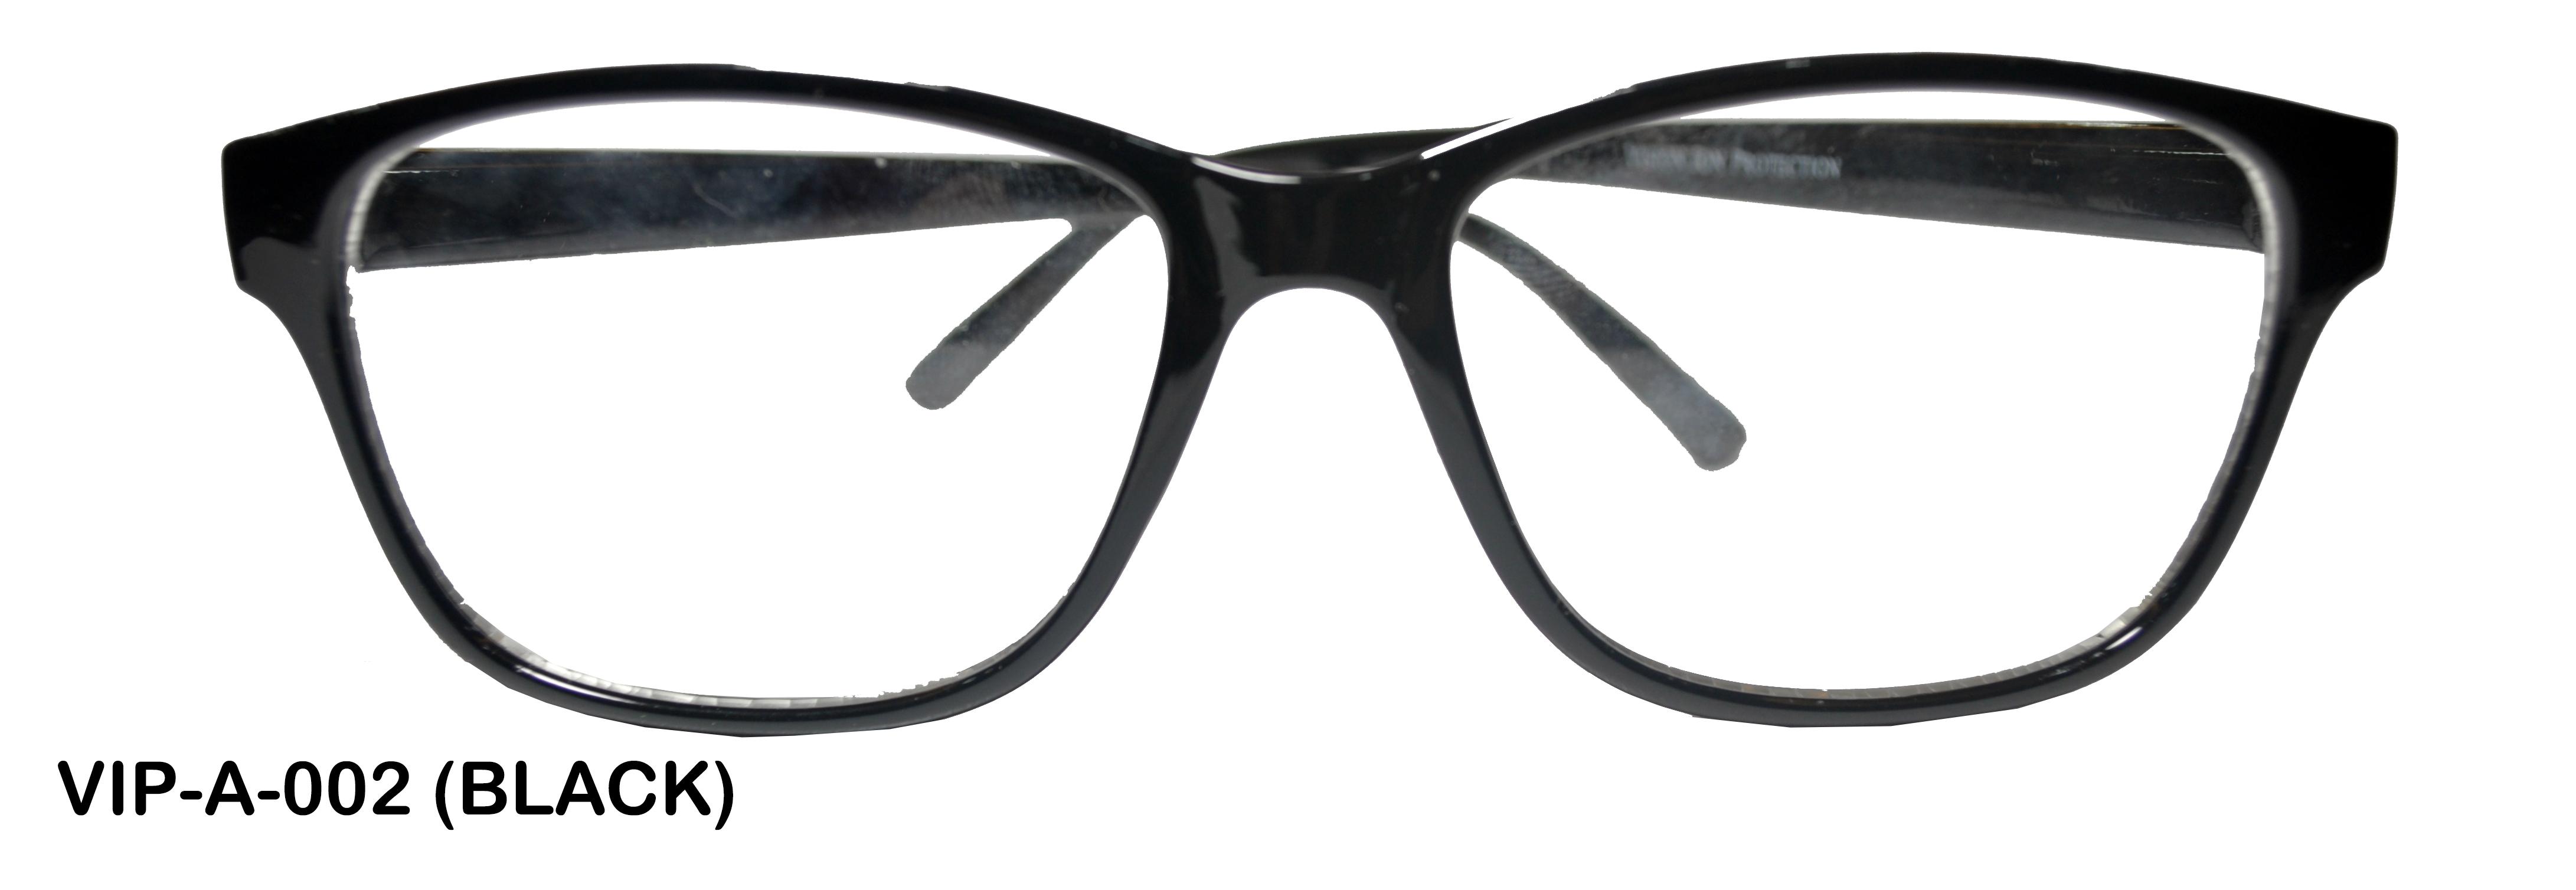 vip-a-002-black